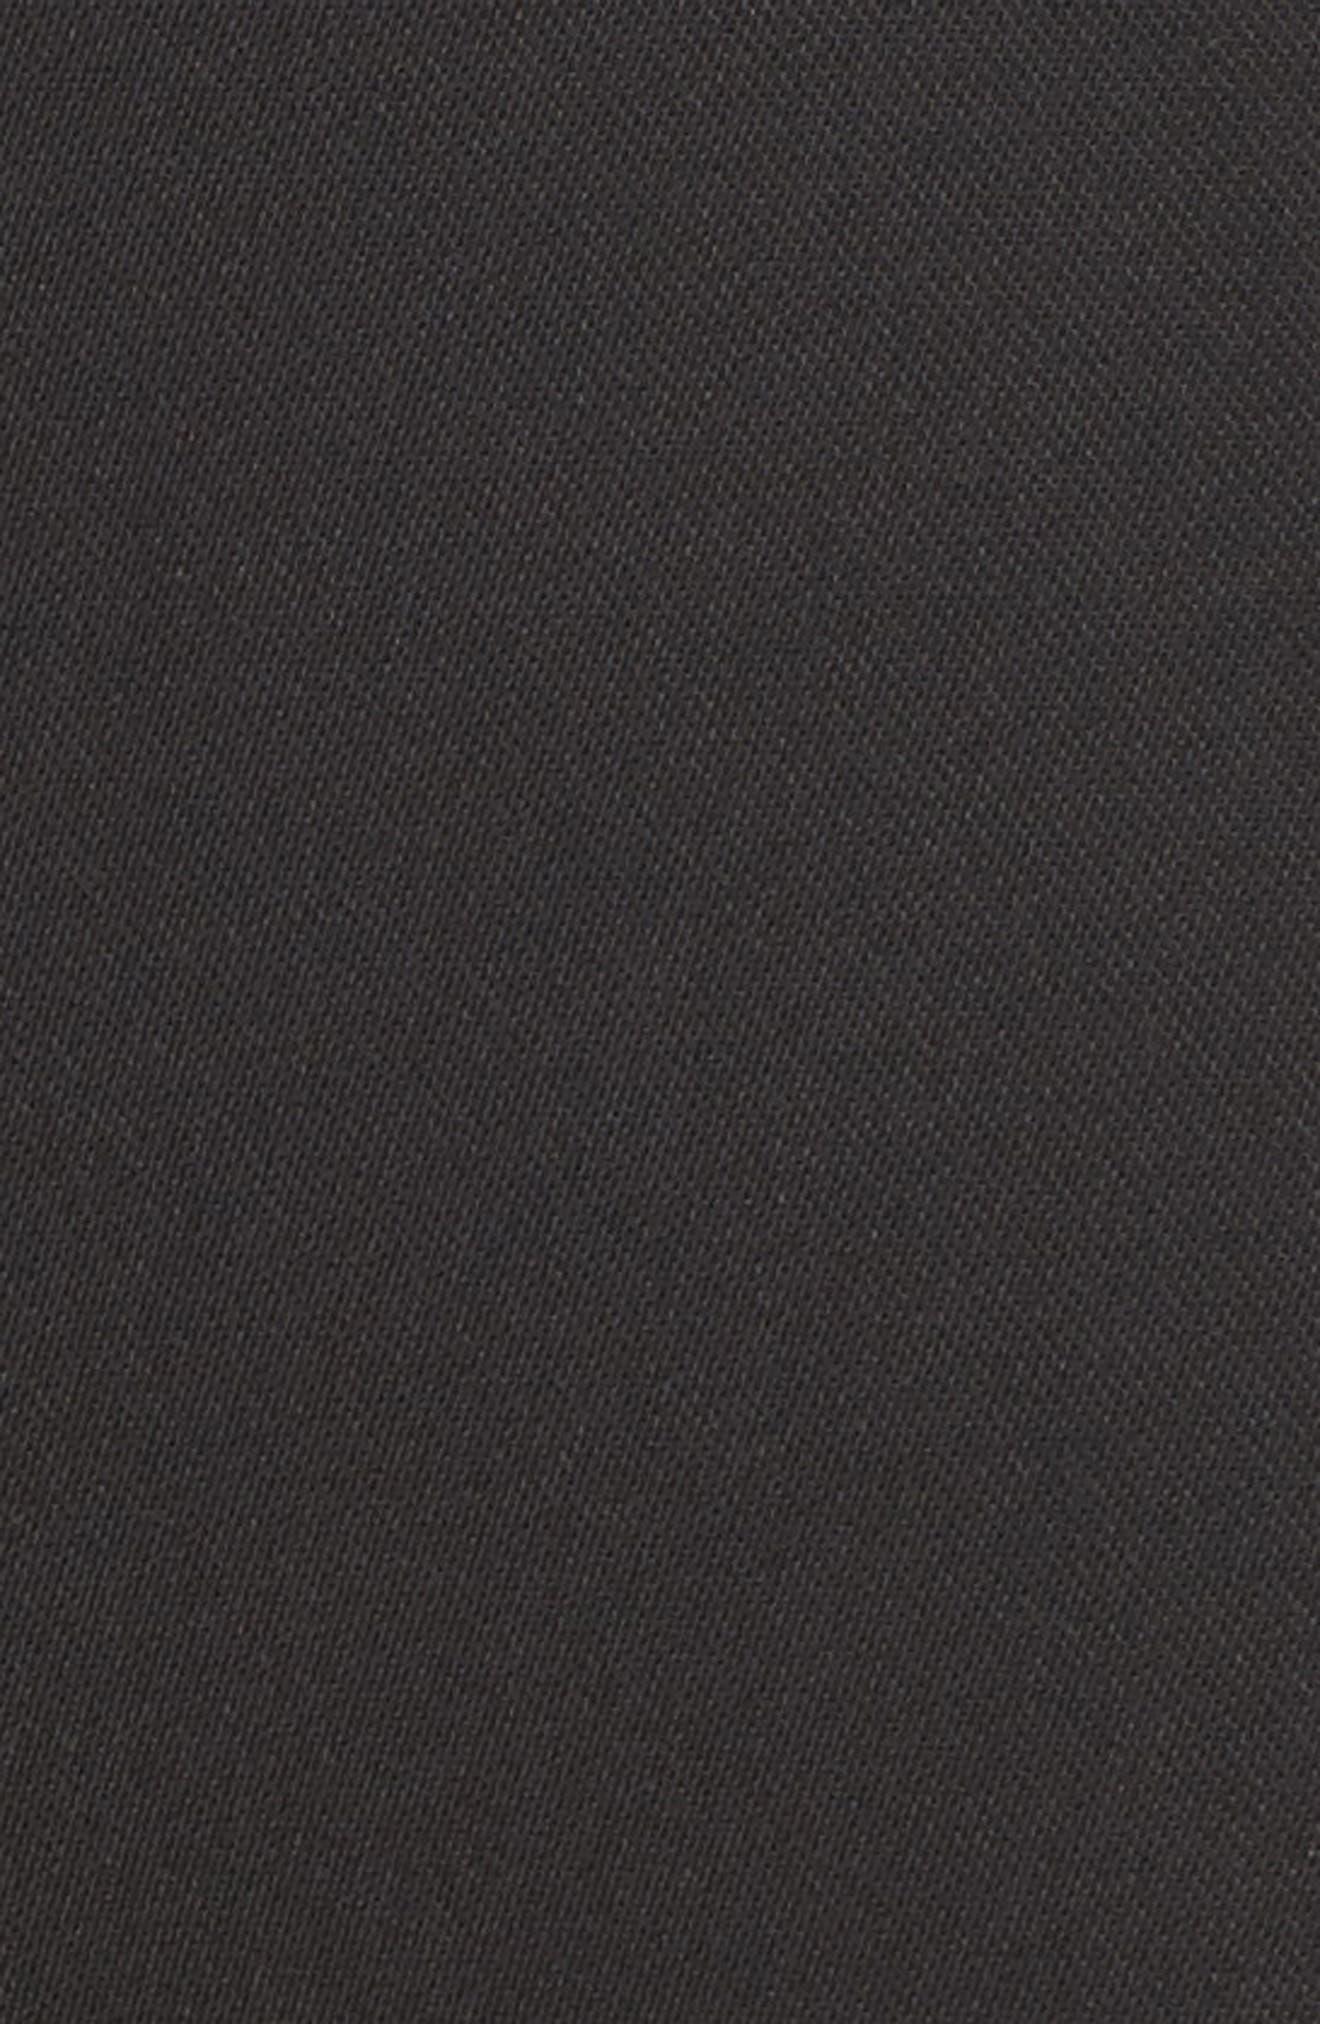 Ceremony Crop Trousers,                             Alternate thumbnail 5, color,                             Black